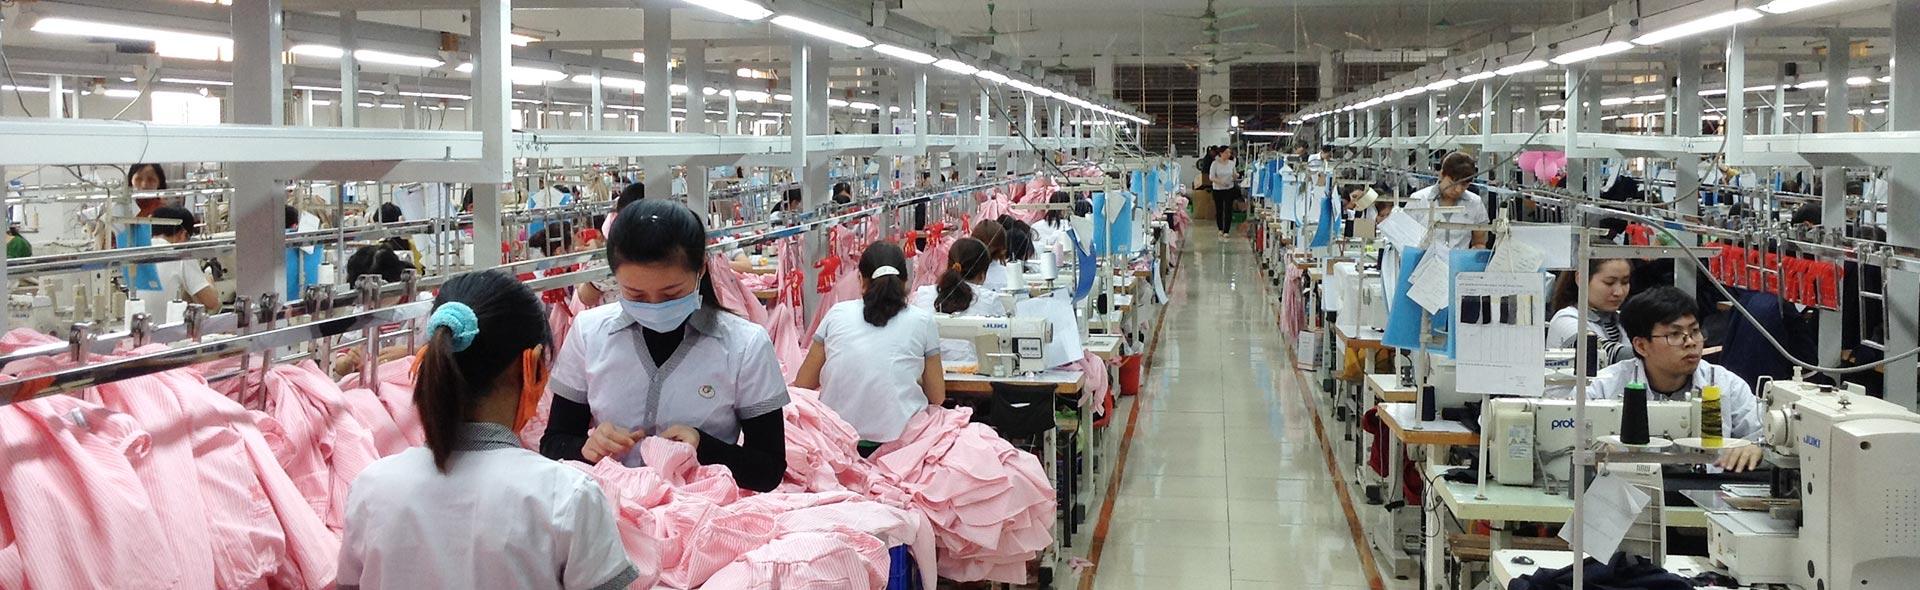 Ninh Binh Garment Export